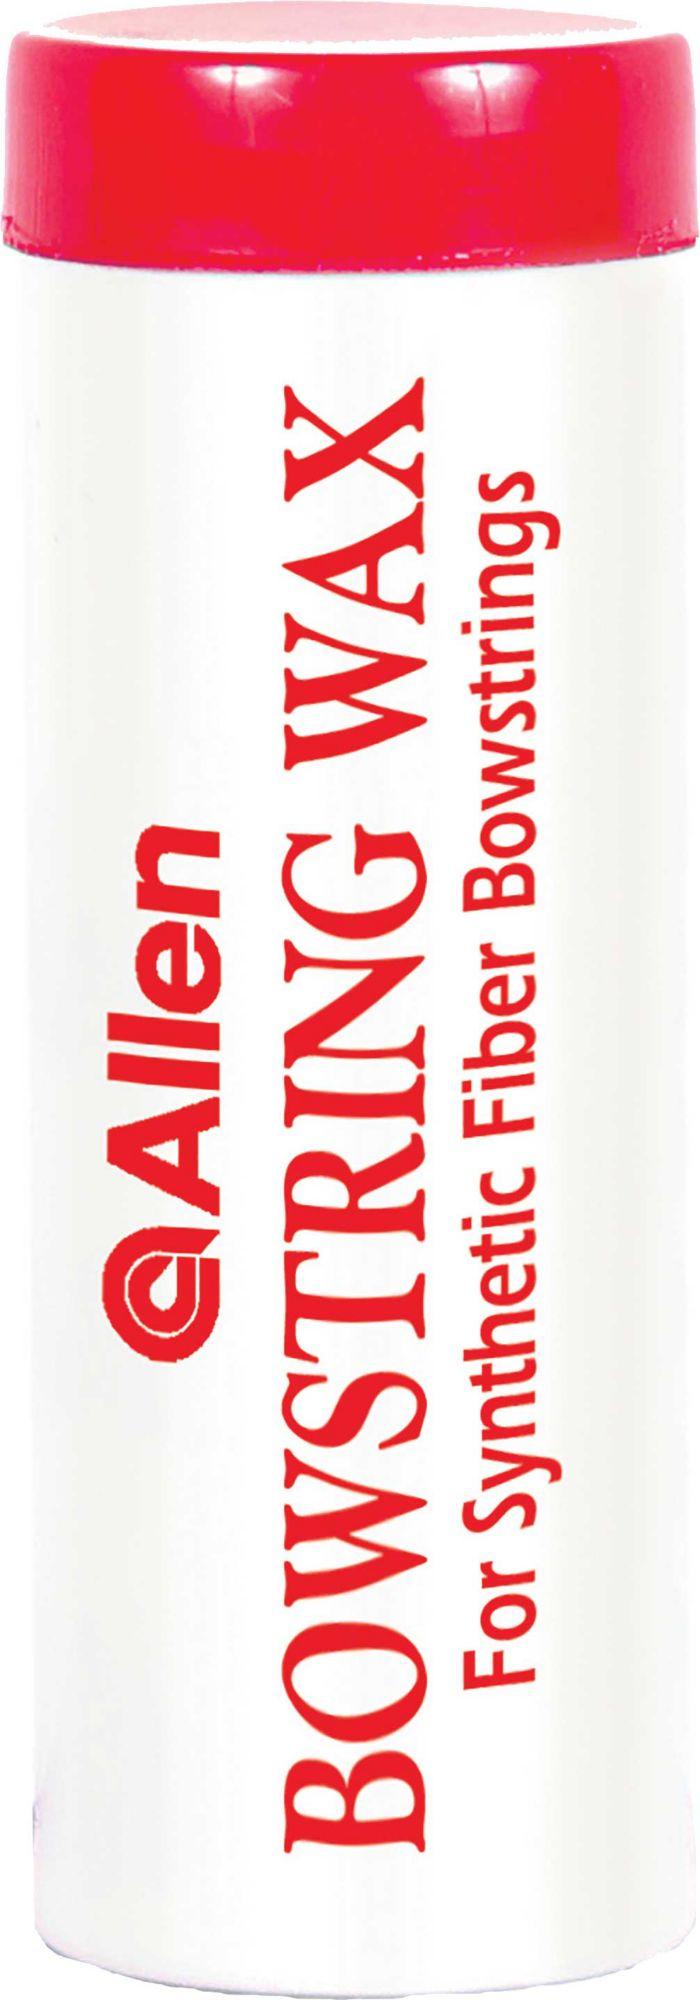 Allen Bowstring Wax thumbnail